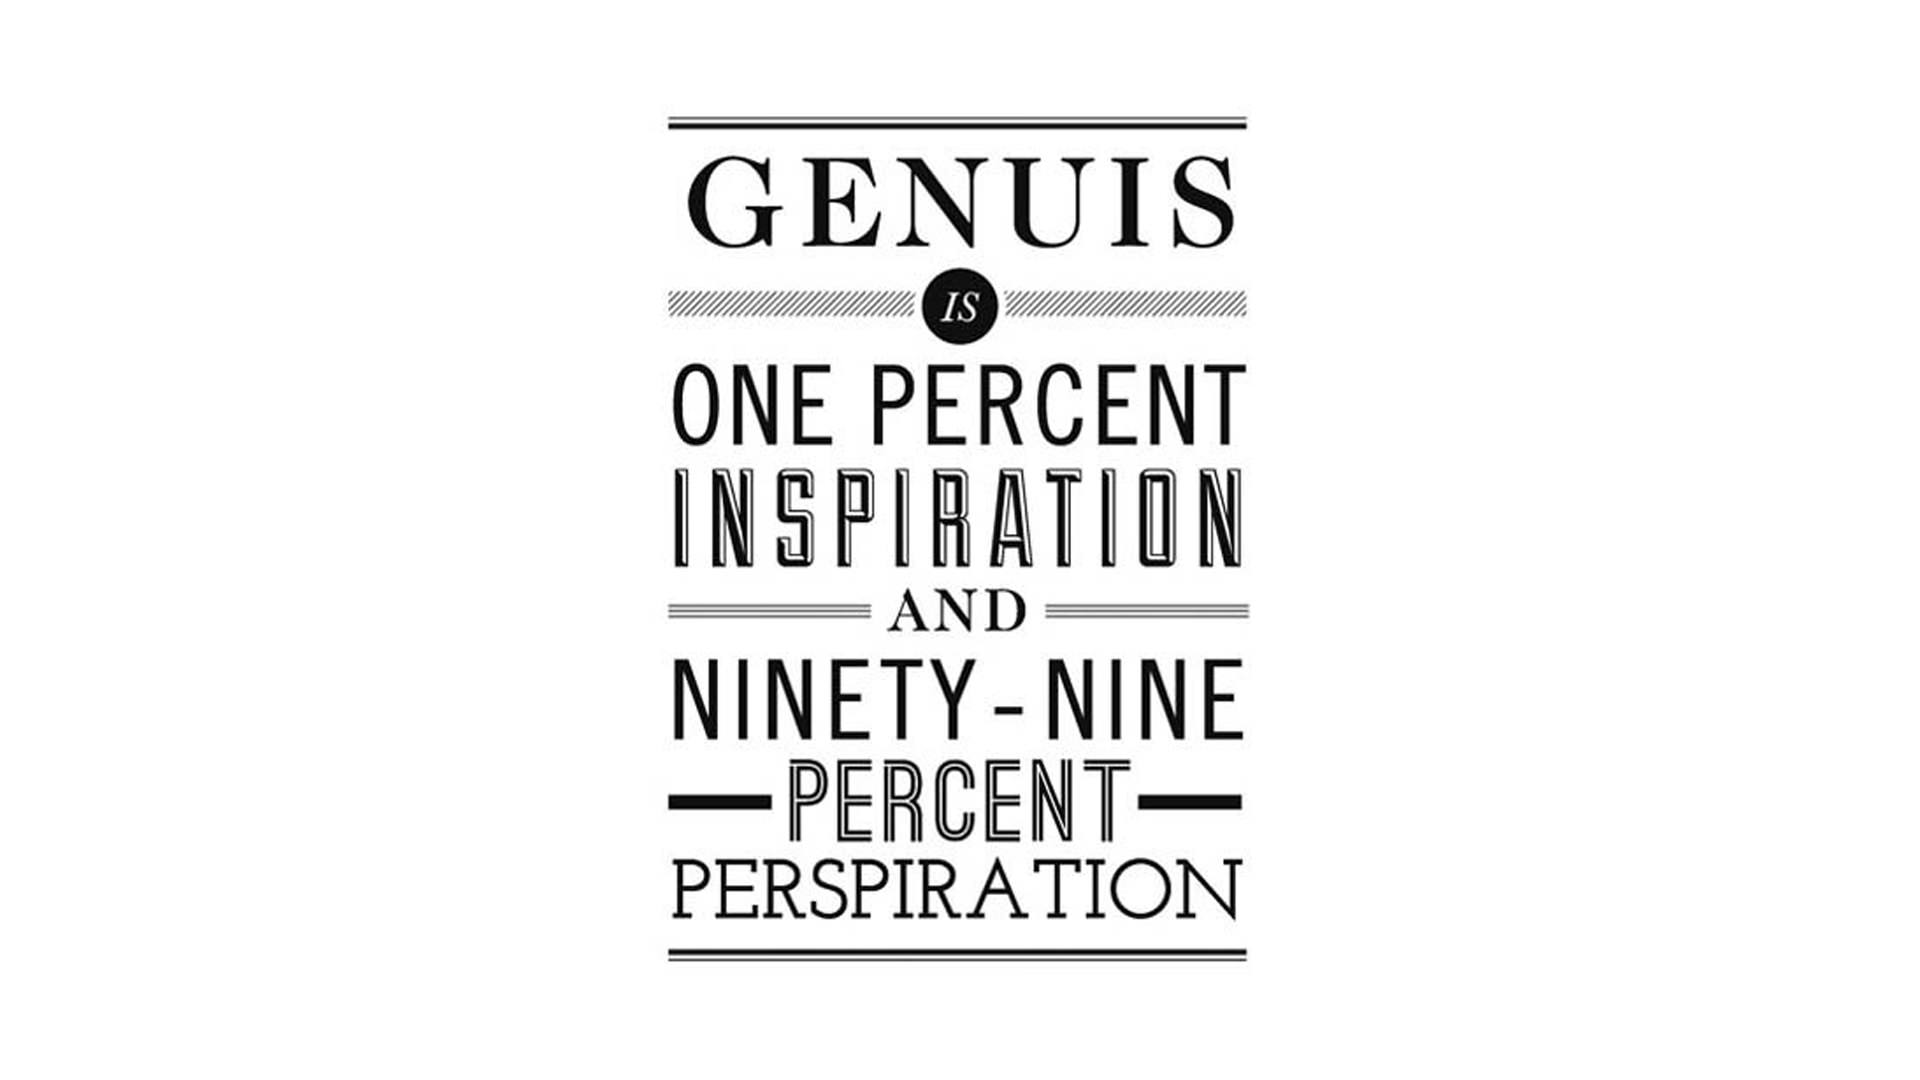 Genius Is One Percent Inspiration, Ninety-Nine Percent Perspiration